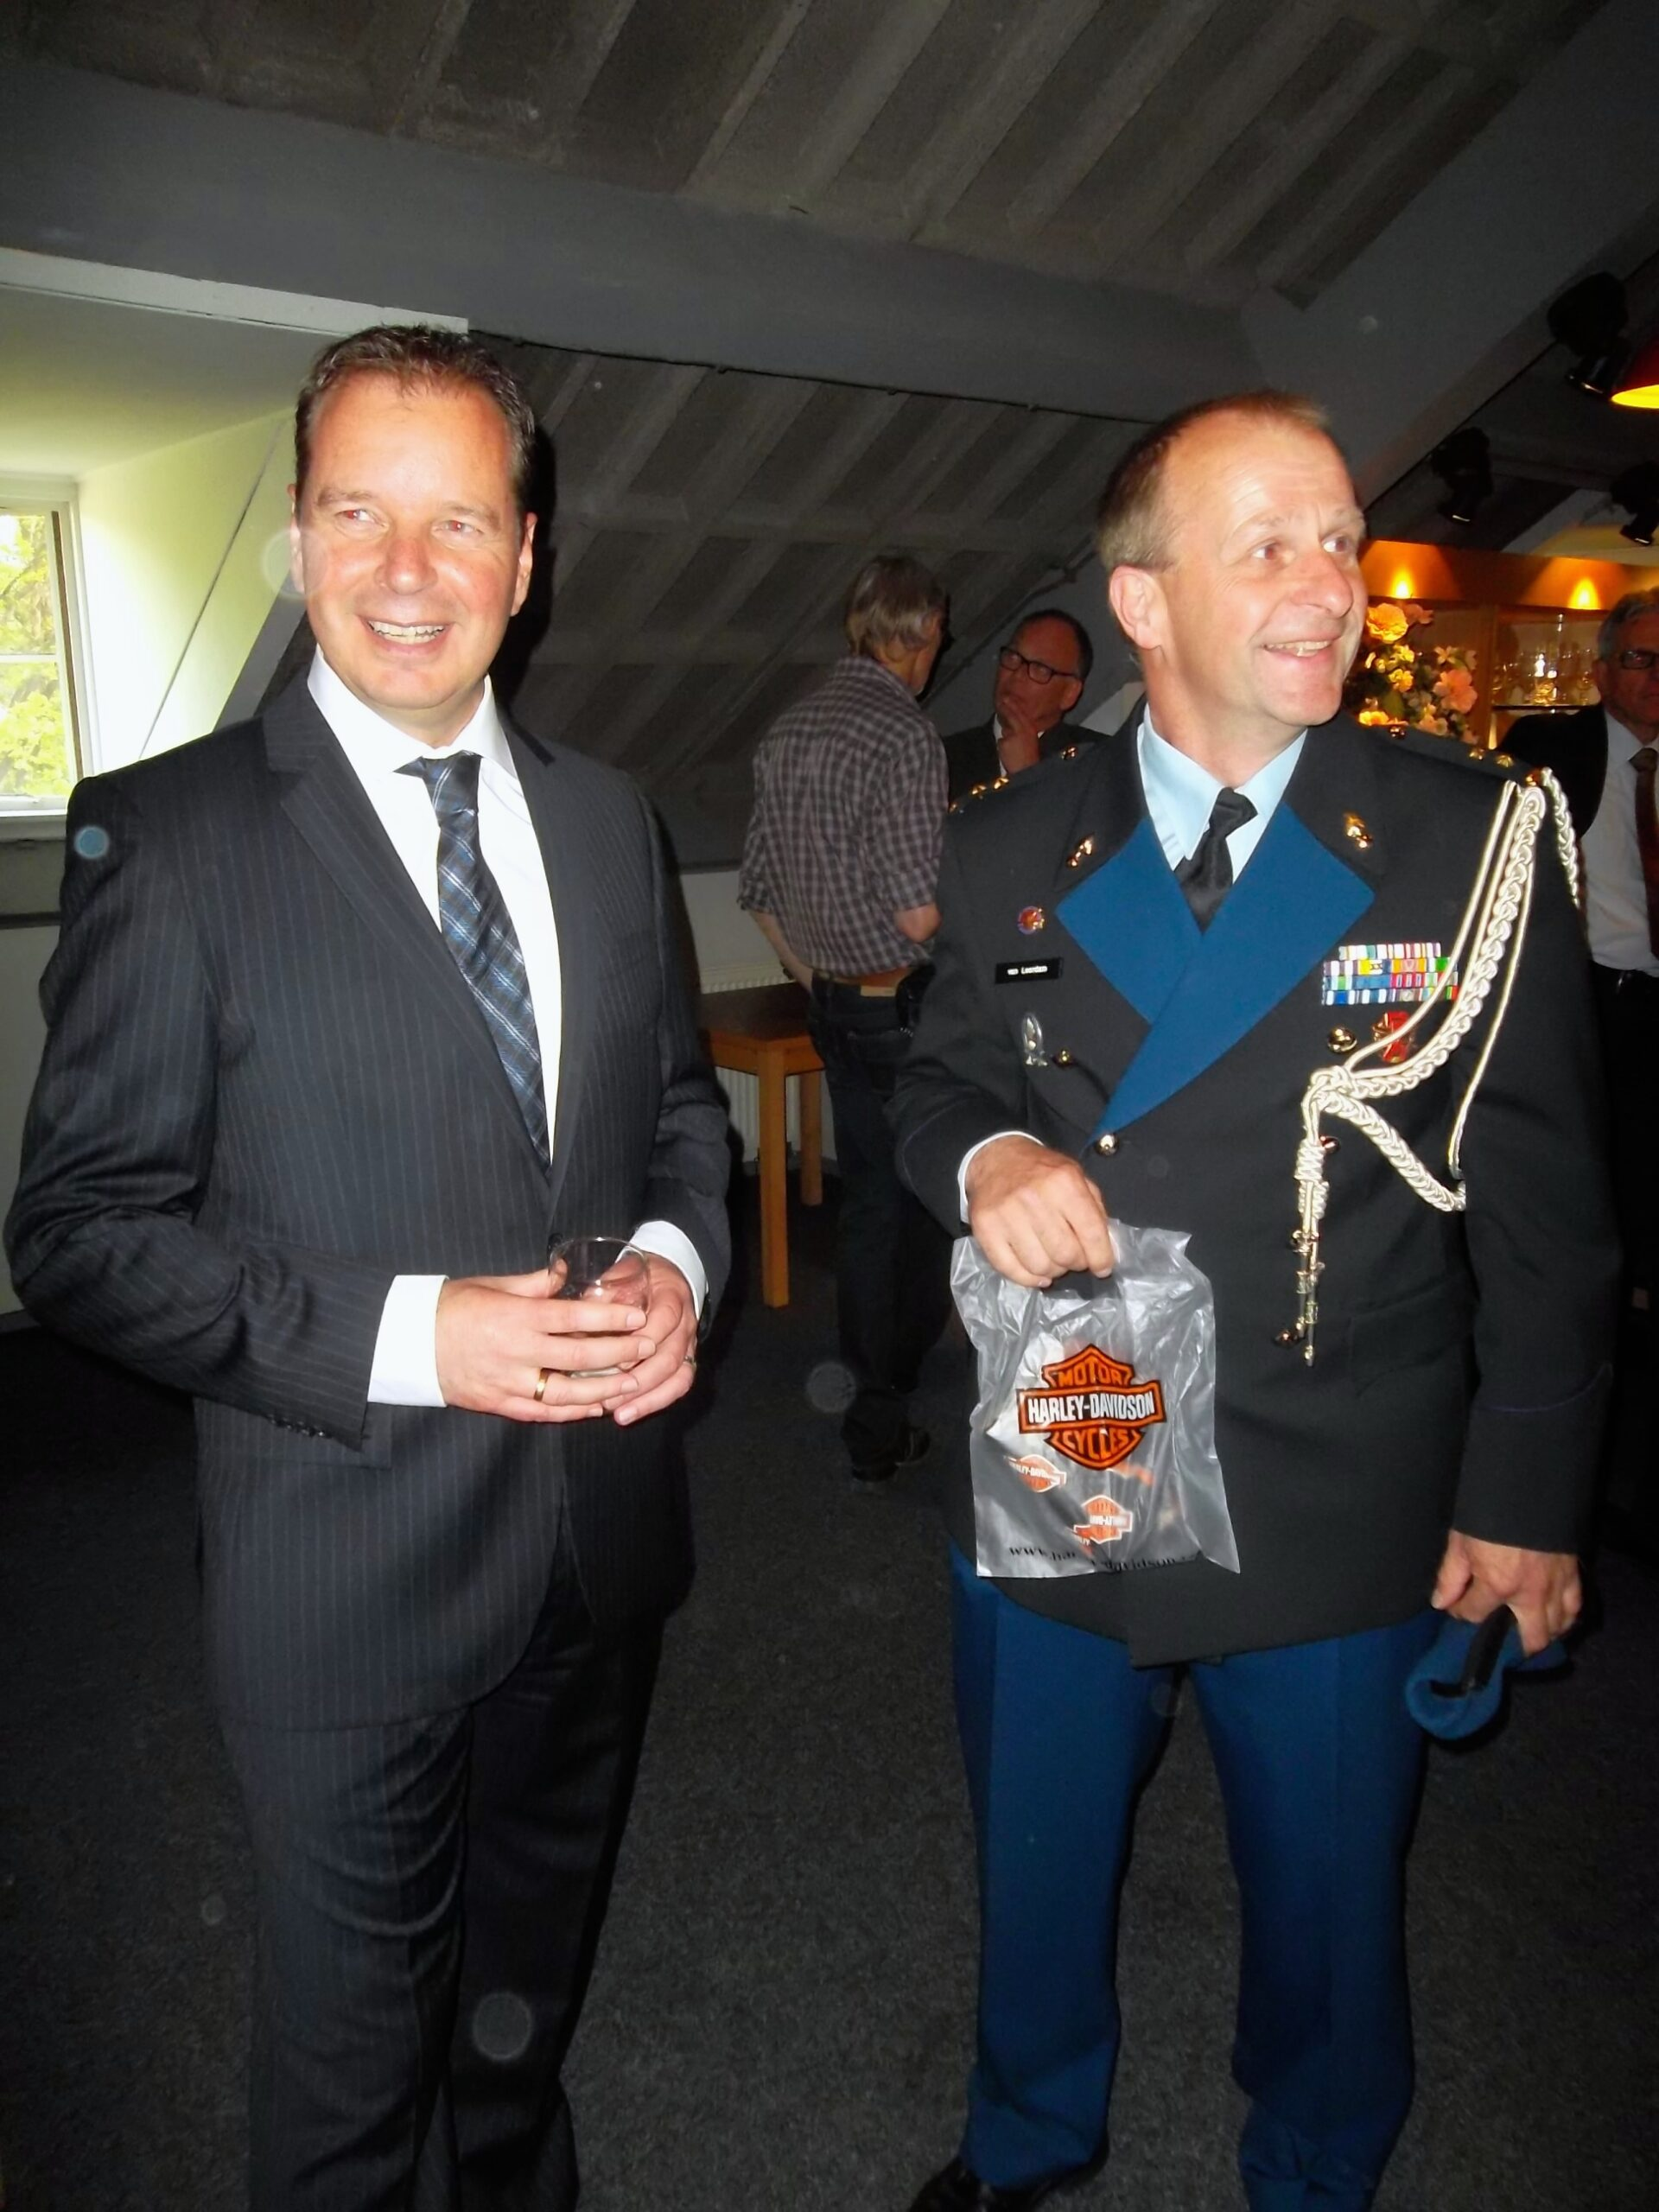 Peter Fonhof